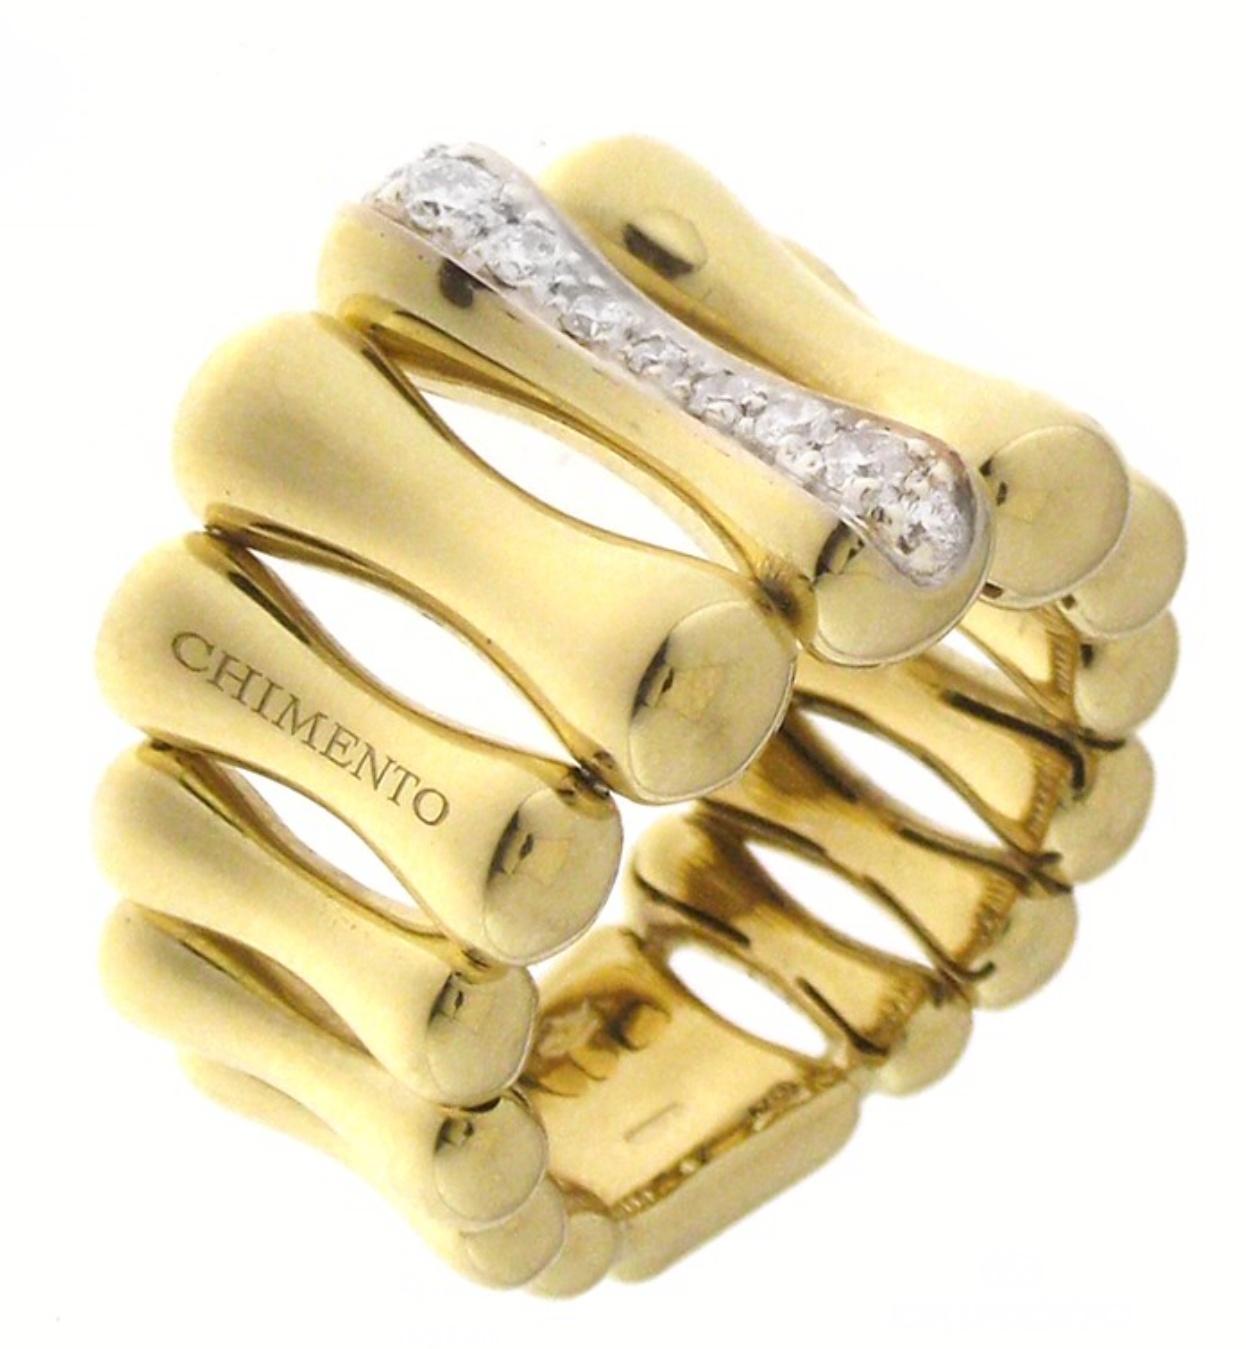 Chimento Damenring Bamboo 1A05895B12 in 750/00 Gelbgold-Brillanten